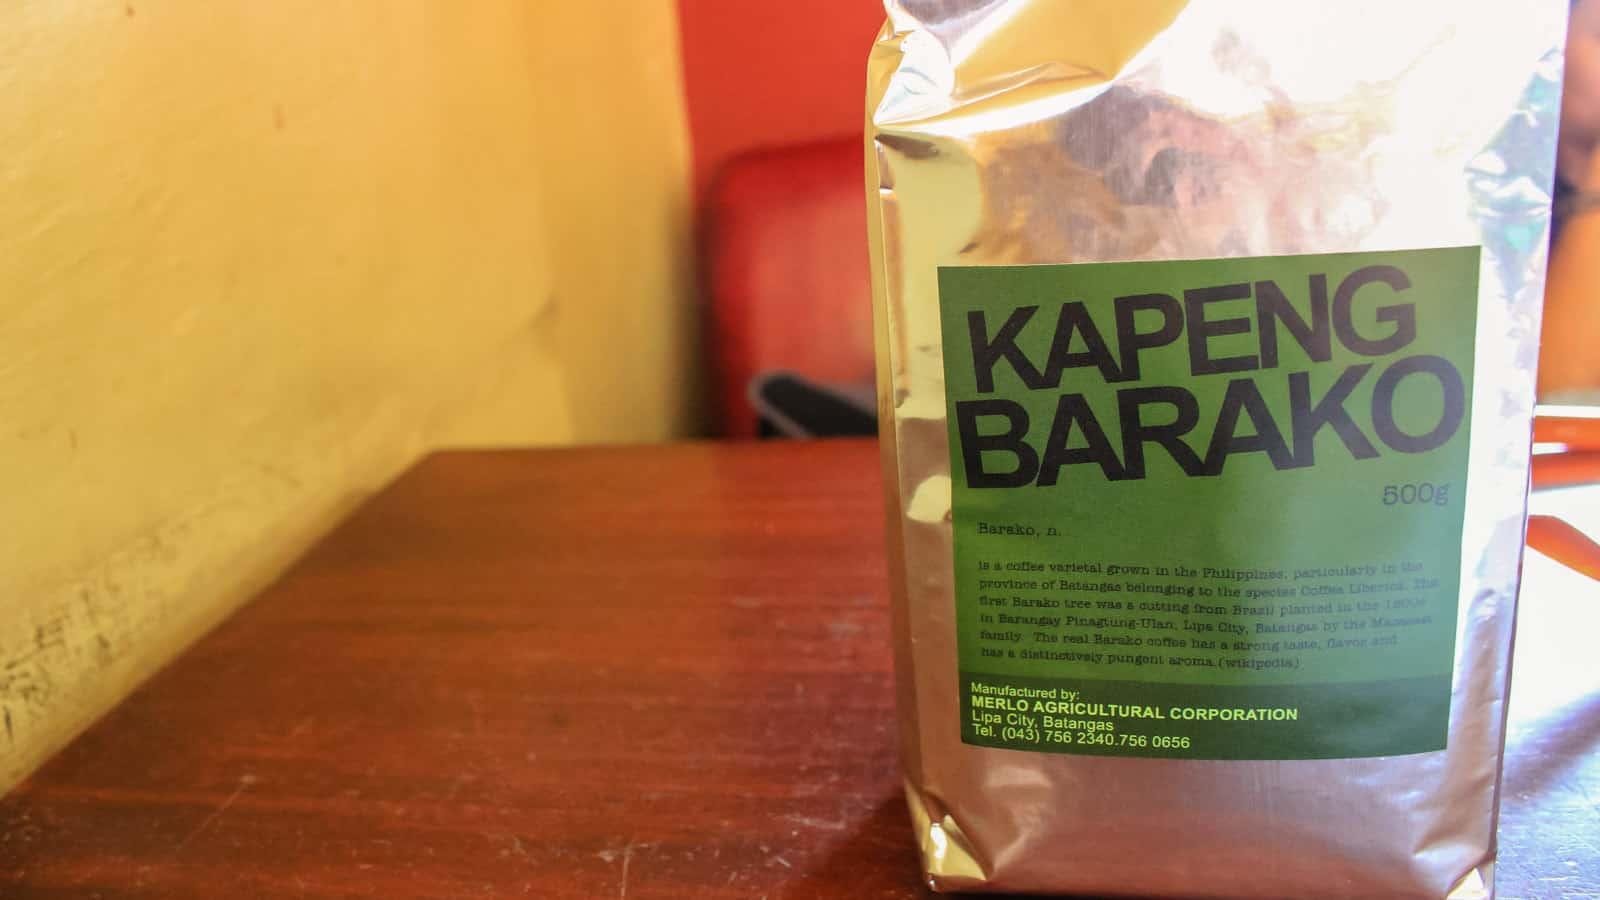 CAFE DE LIPA: Reviving Kapeng Barako Glory in Batangas, Philippines